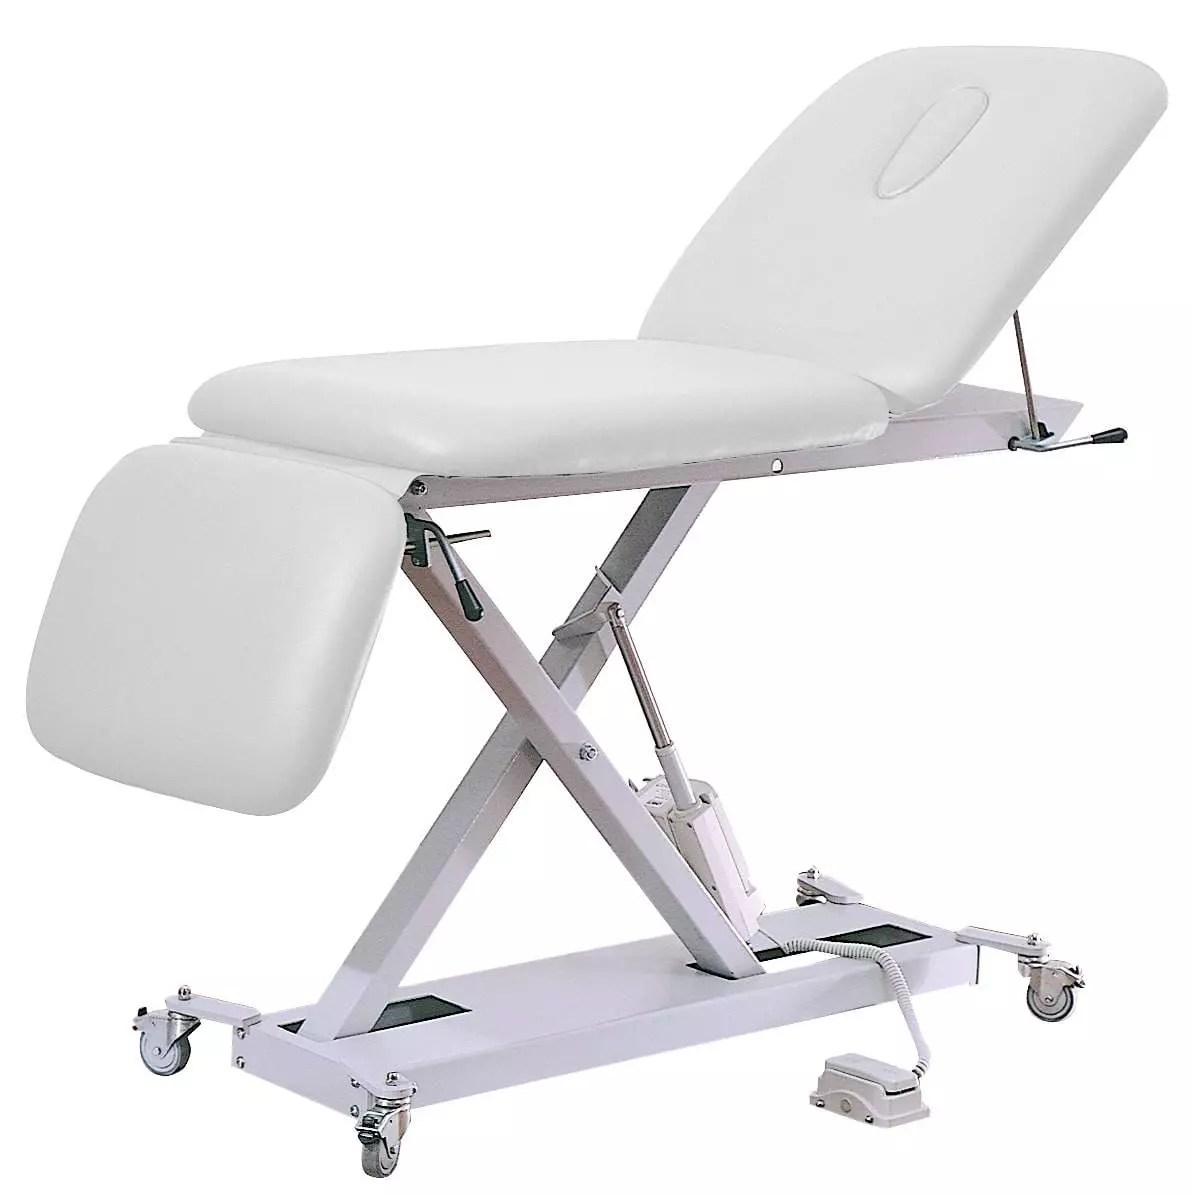 Offer Affinity Sports  Beauty Pro Electric Massage Table - Body -7943